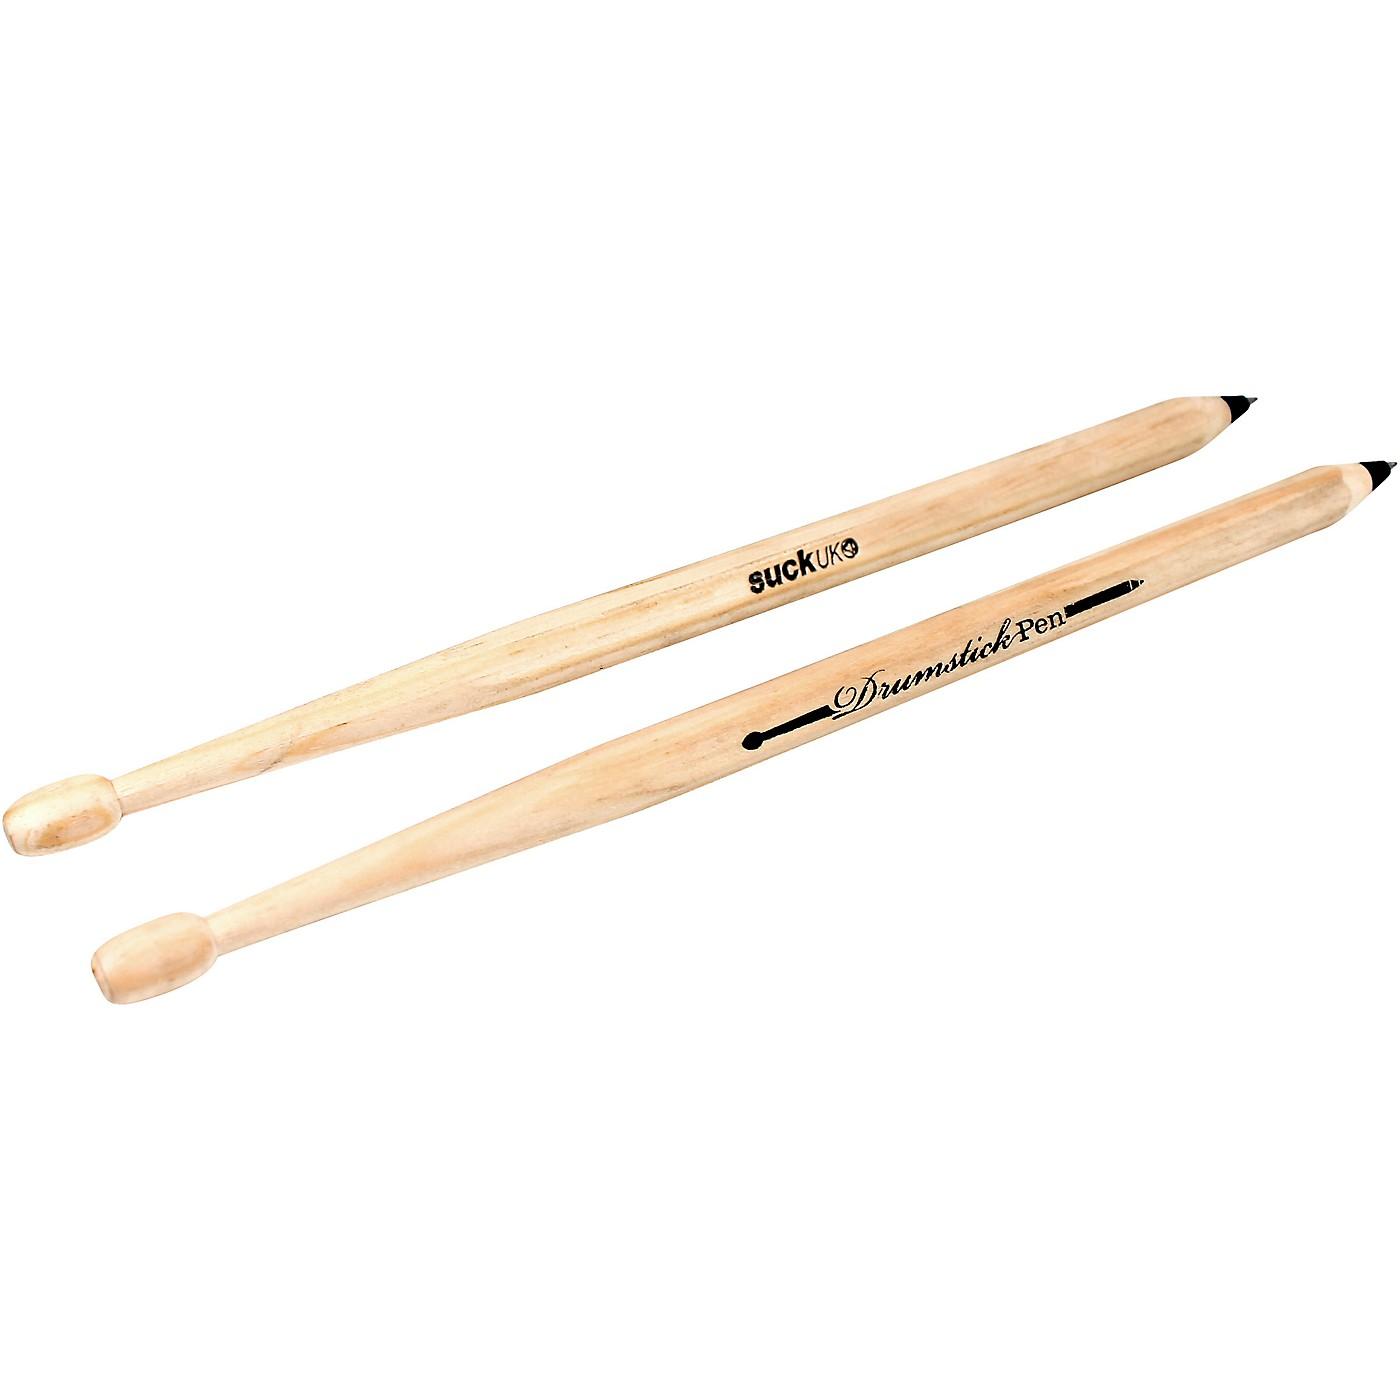 SK Drum Stick Pens thumbnail